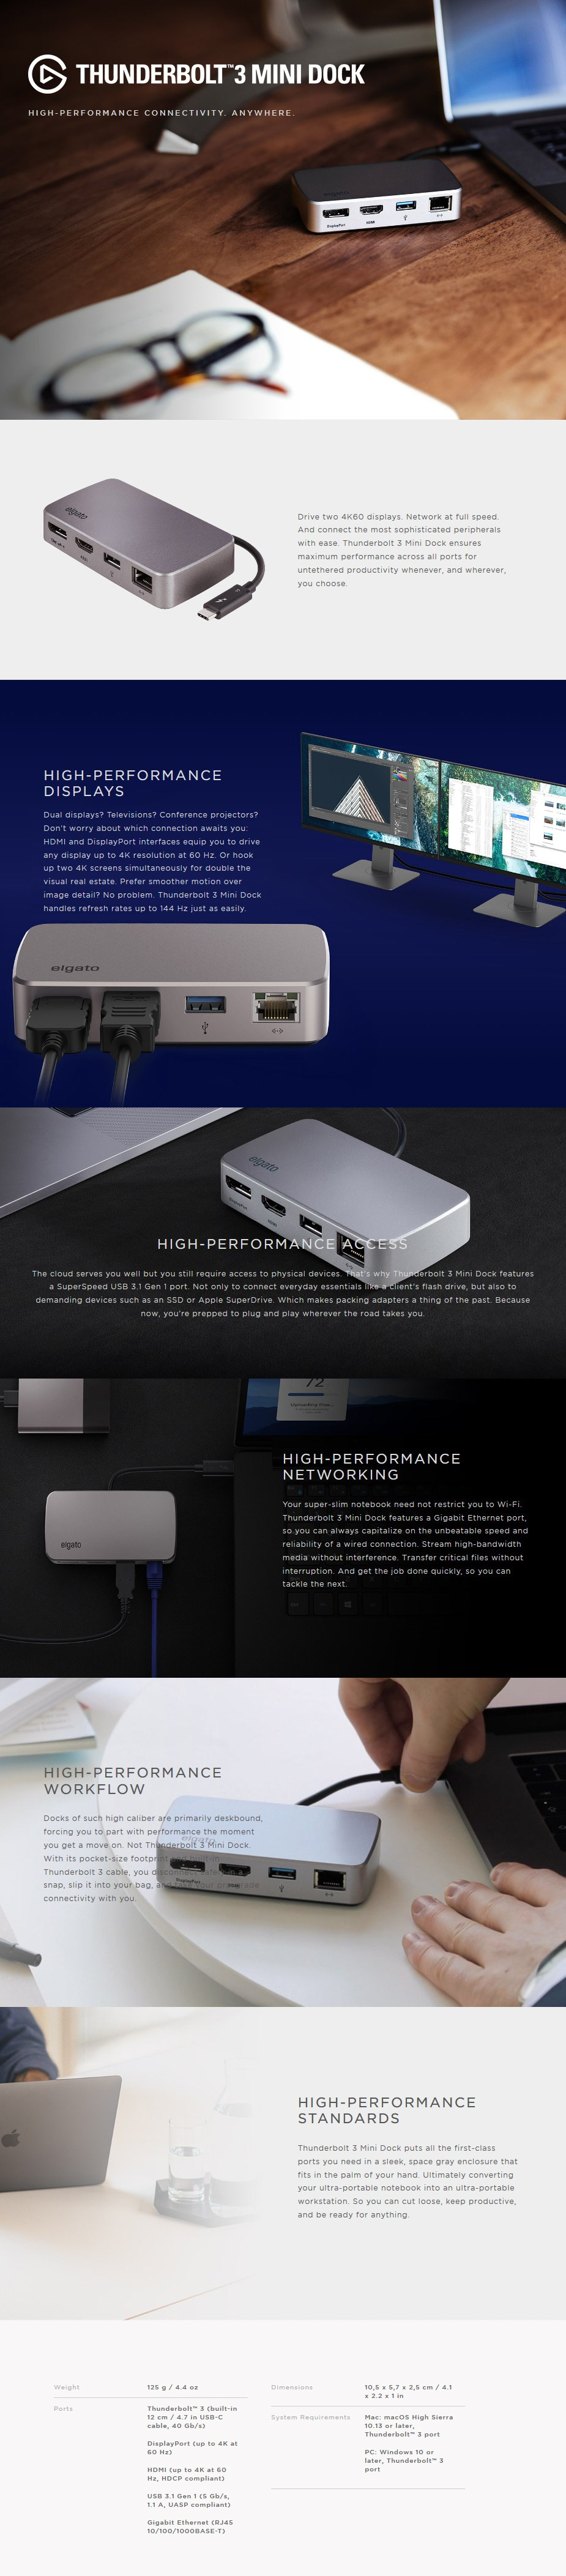 Elgato Thunderbolt 3 Mini Dock - 10DAB9901 | Mwave com au